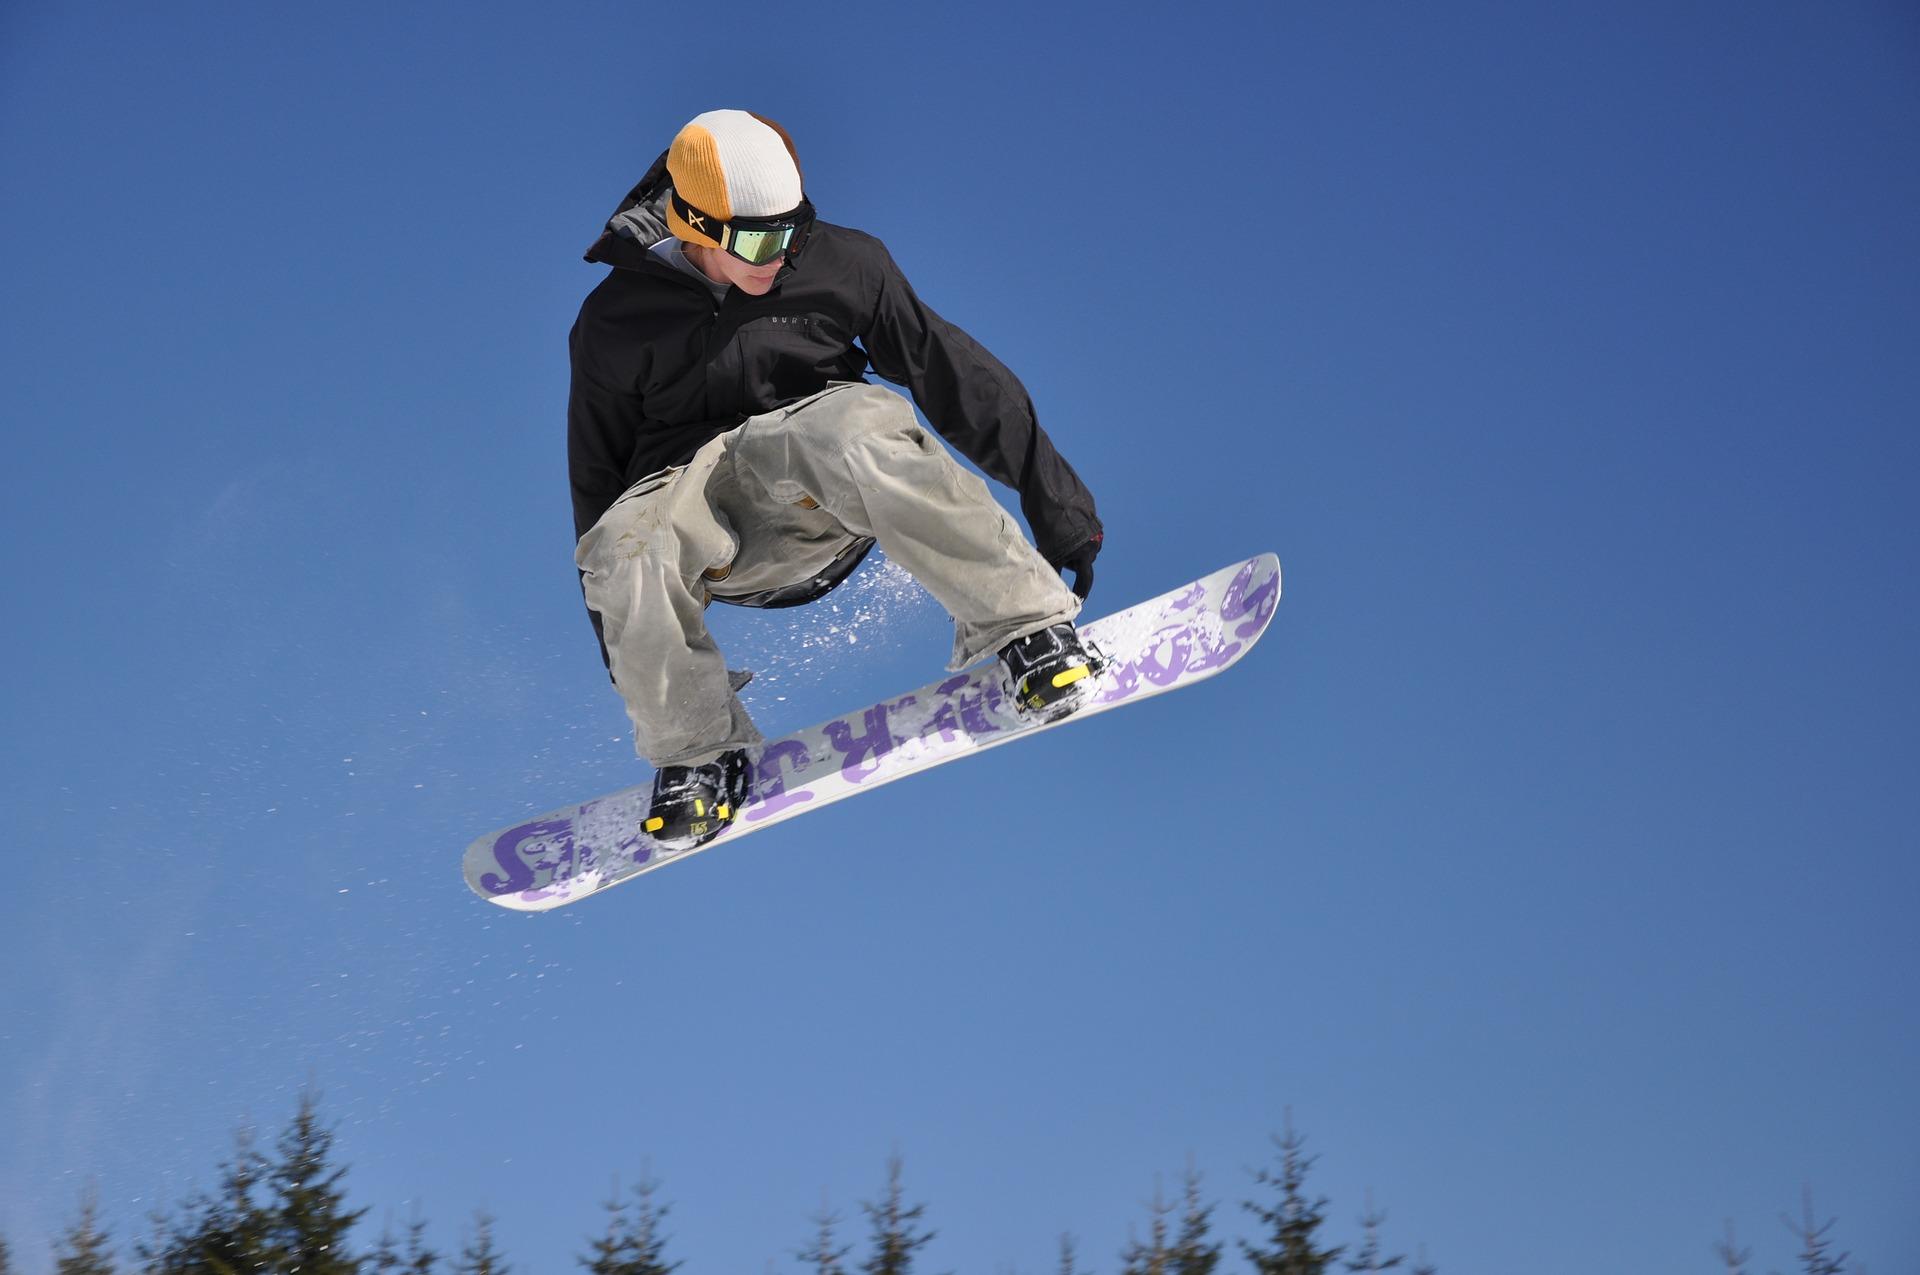 snowboarding-3176182_1920